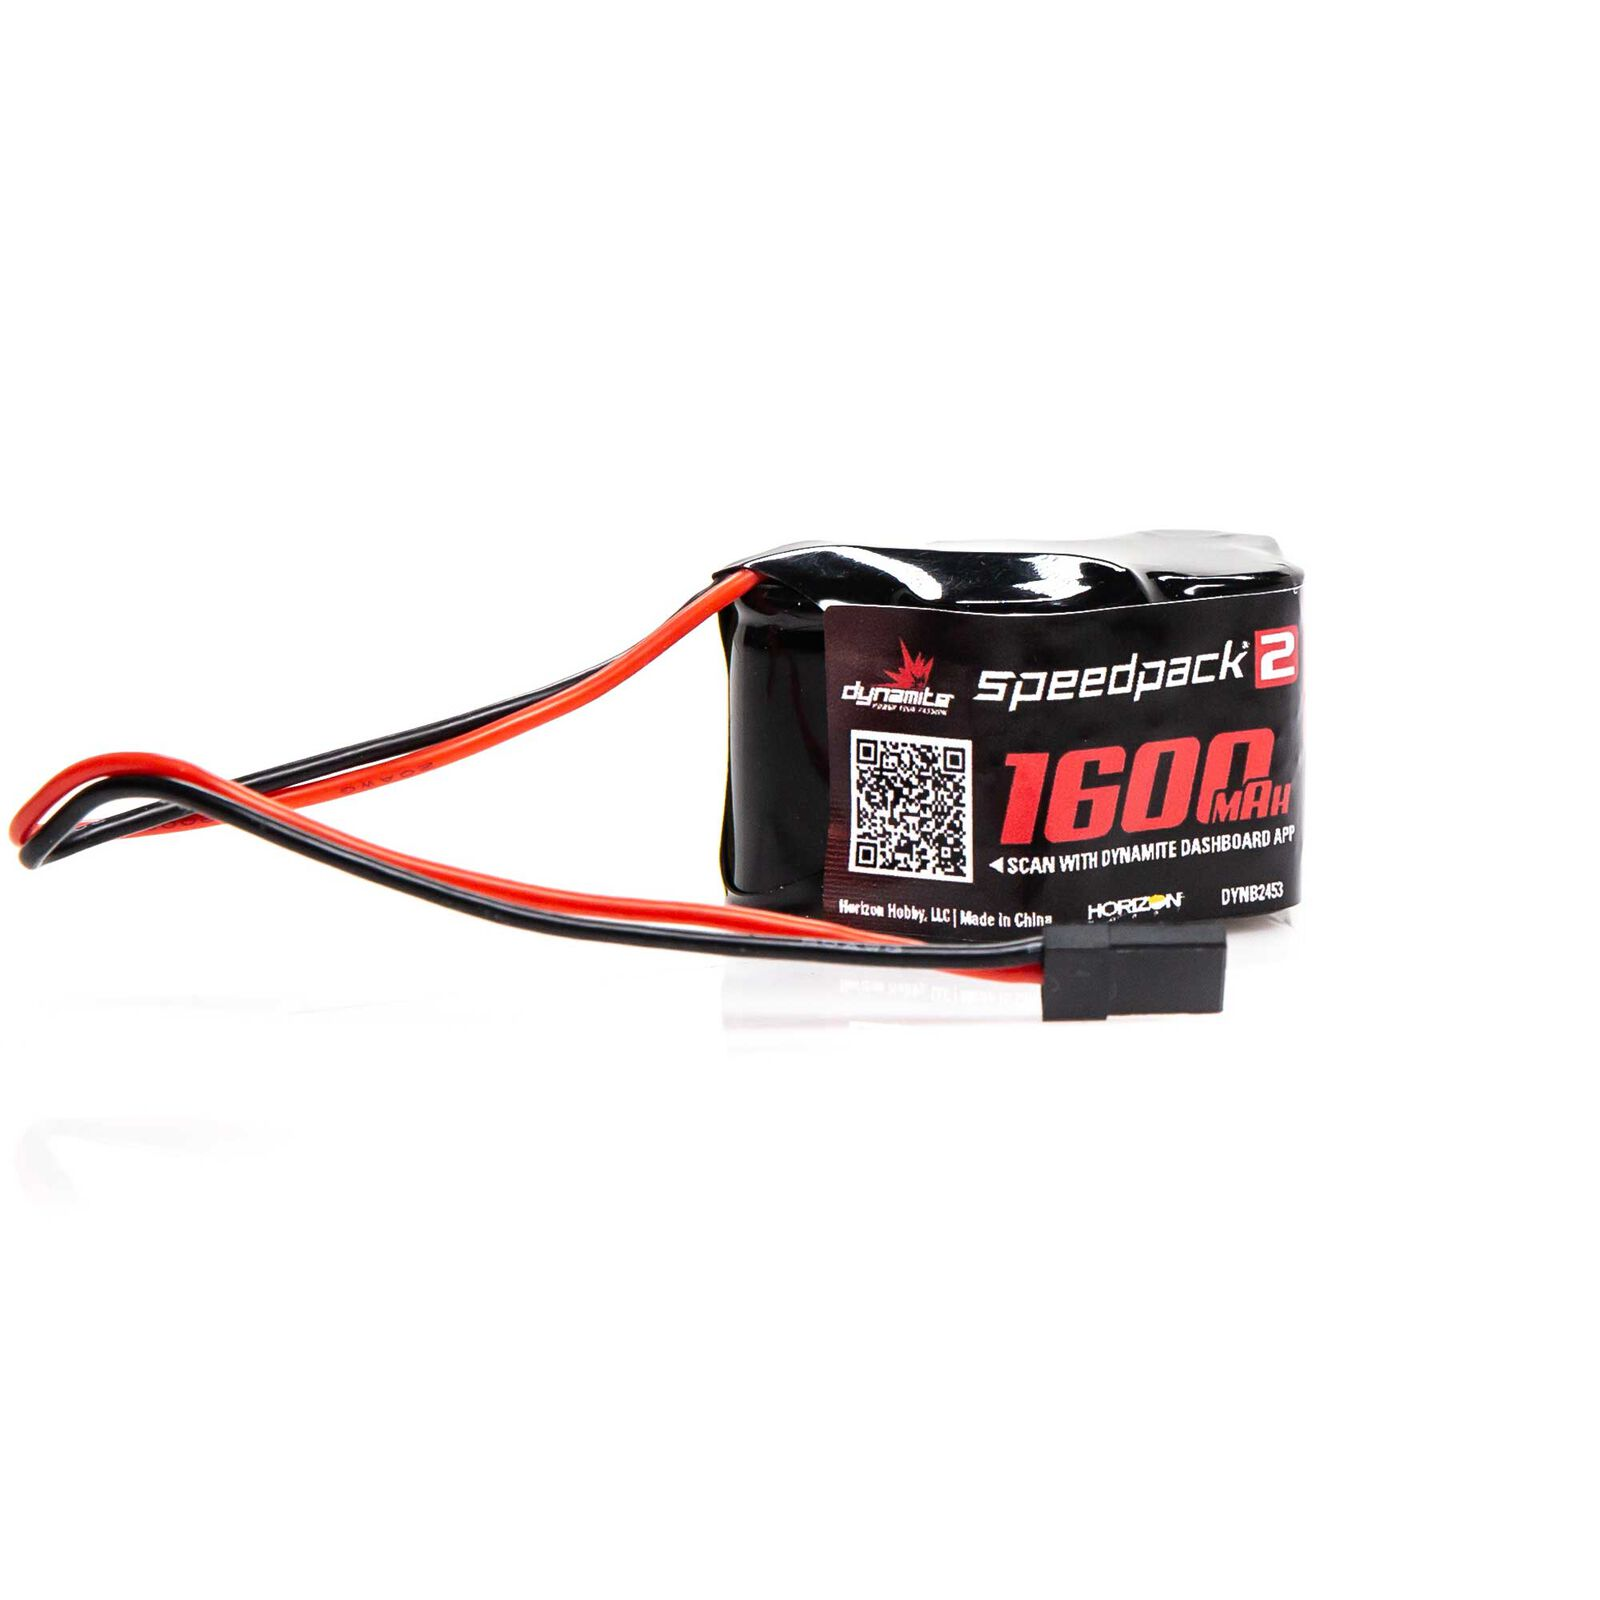 Speedpack2 6V 1600mAh 5C NiMH, 3+2 Hump Receiver Pack